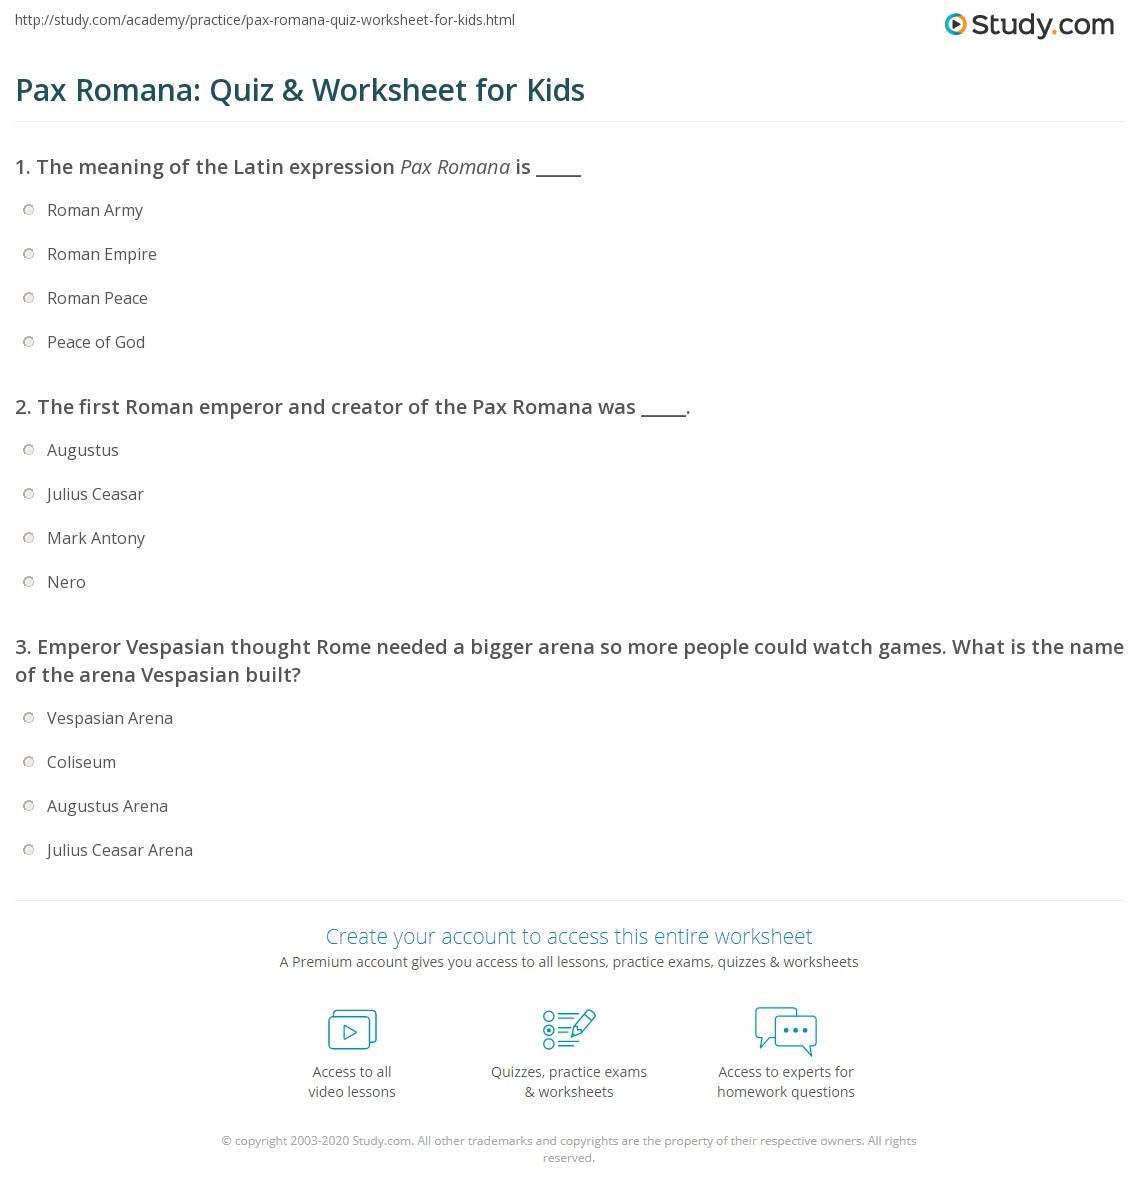 Pax Romana Quiz Amp Worksheet For Kids